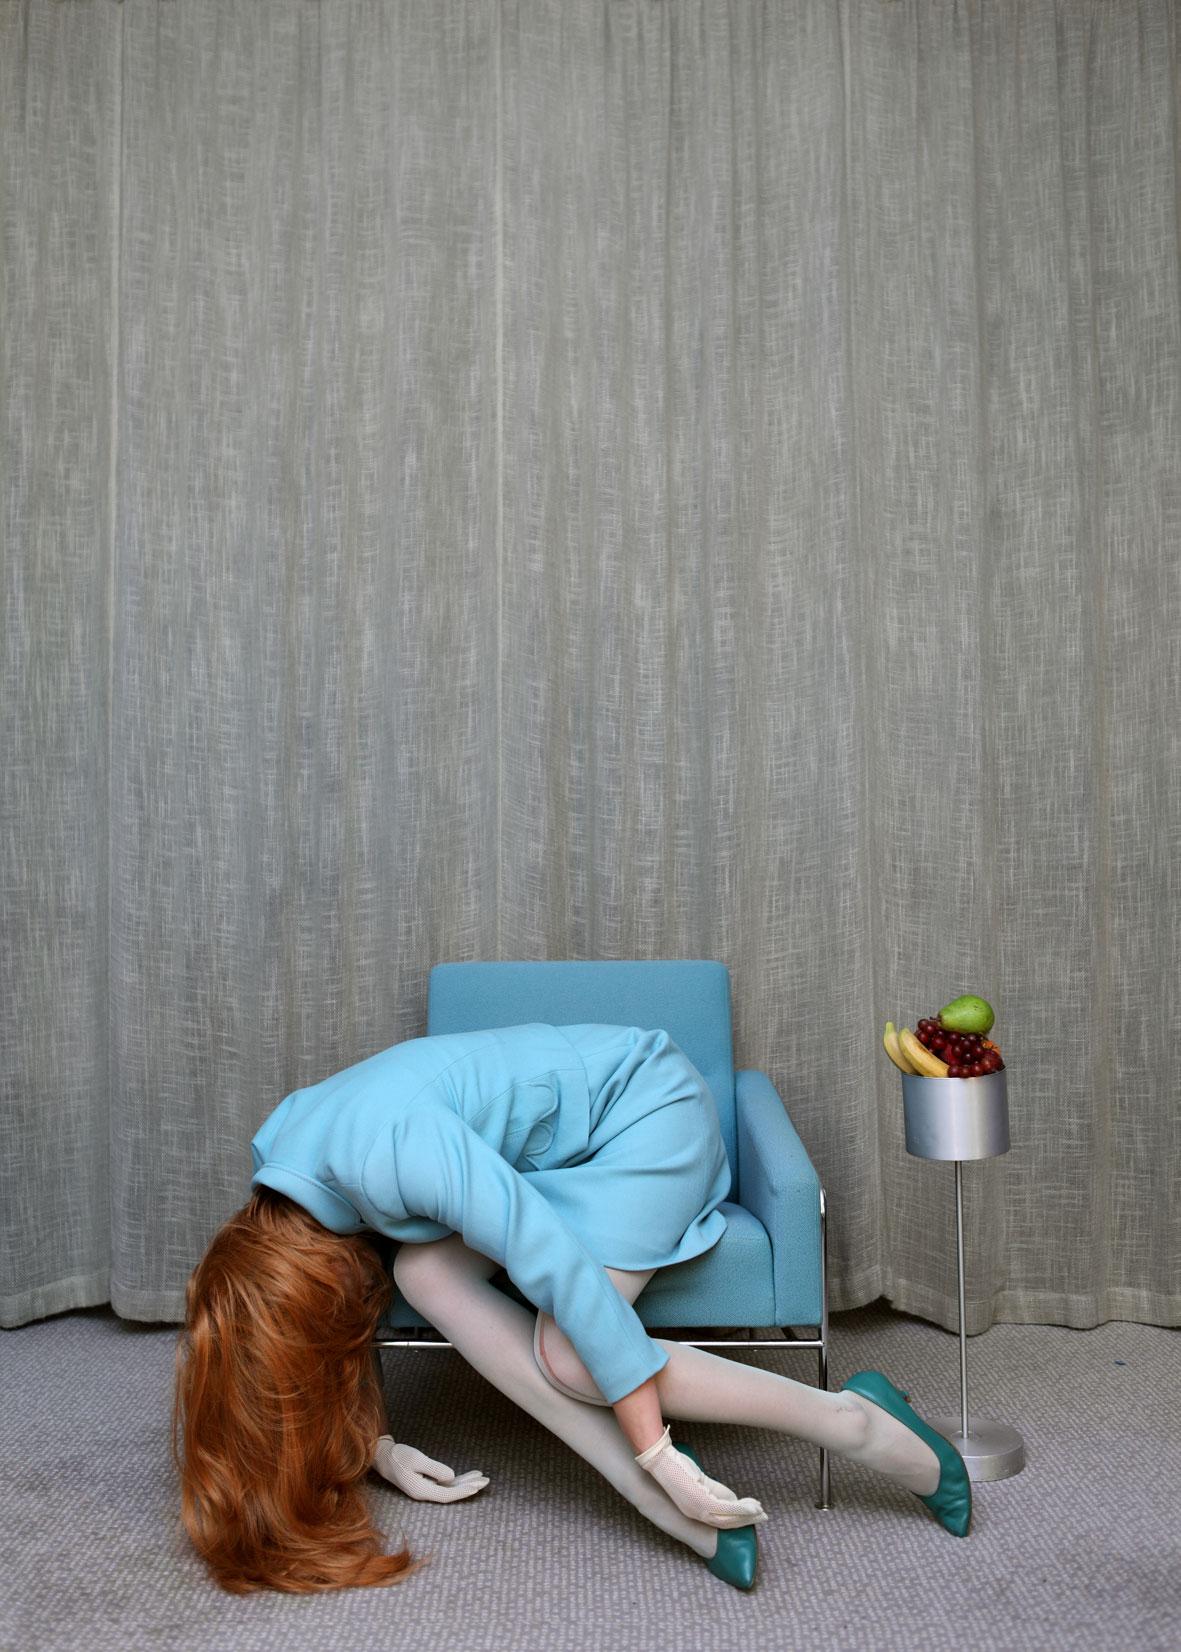 Anja Niemi, Starlets | http://www.yellowtrace.com.au/2013/10/17/anja-niemi-self-photography/